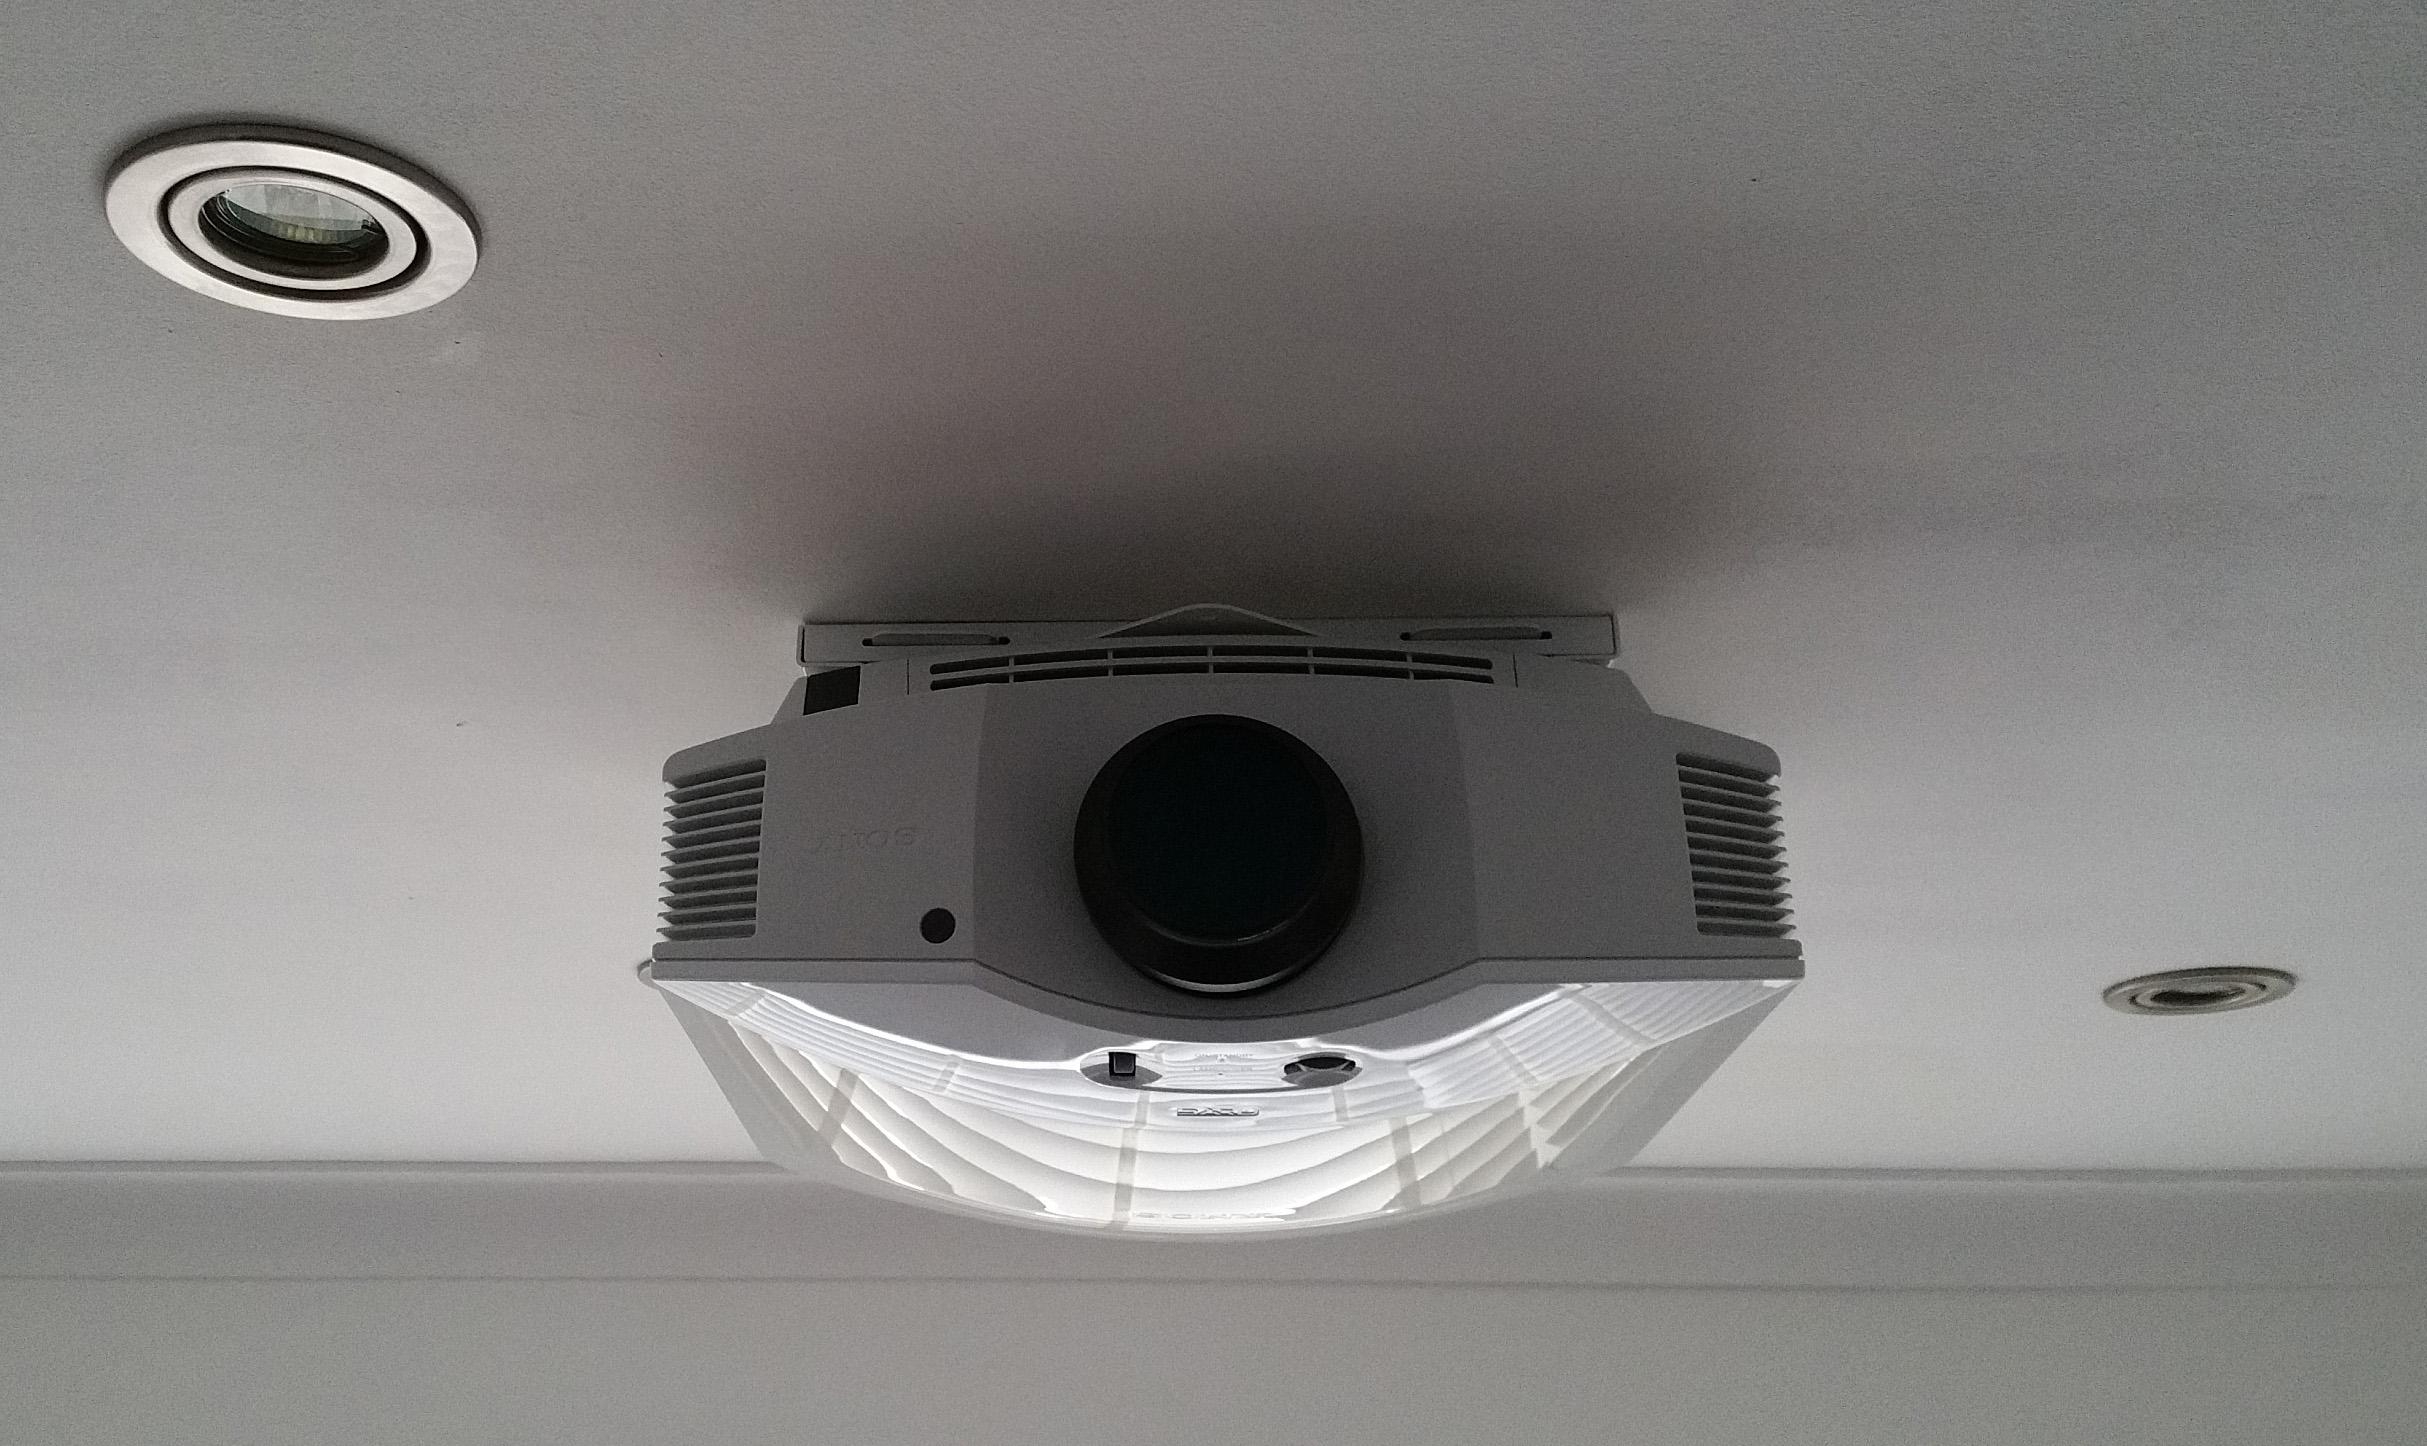 Technic Projector Mount For Sony HW45-65 & VW270-570 Series Projectors